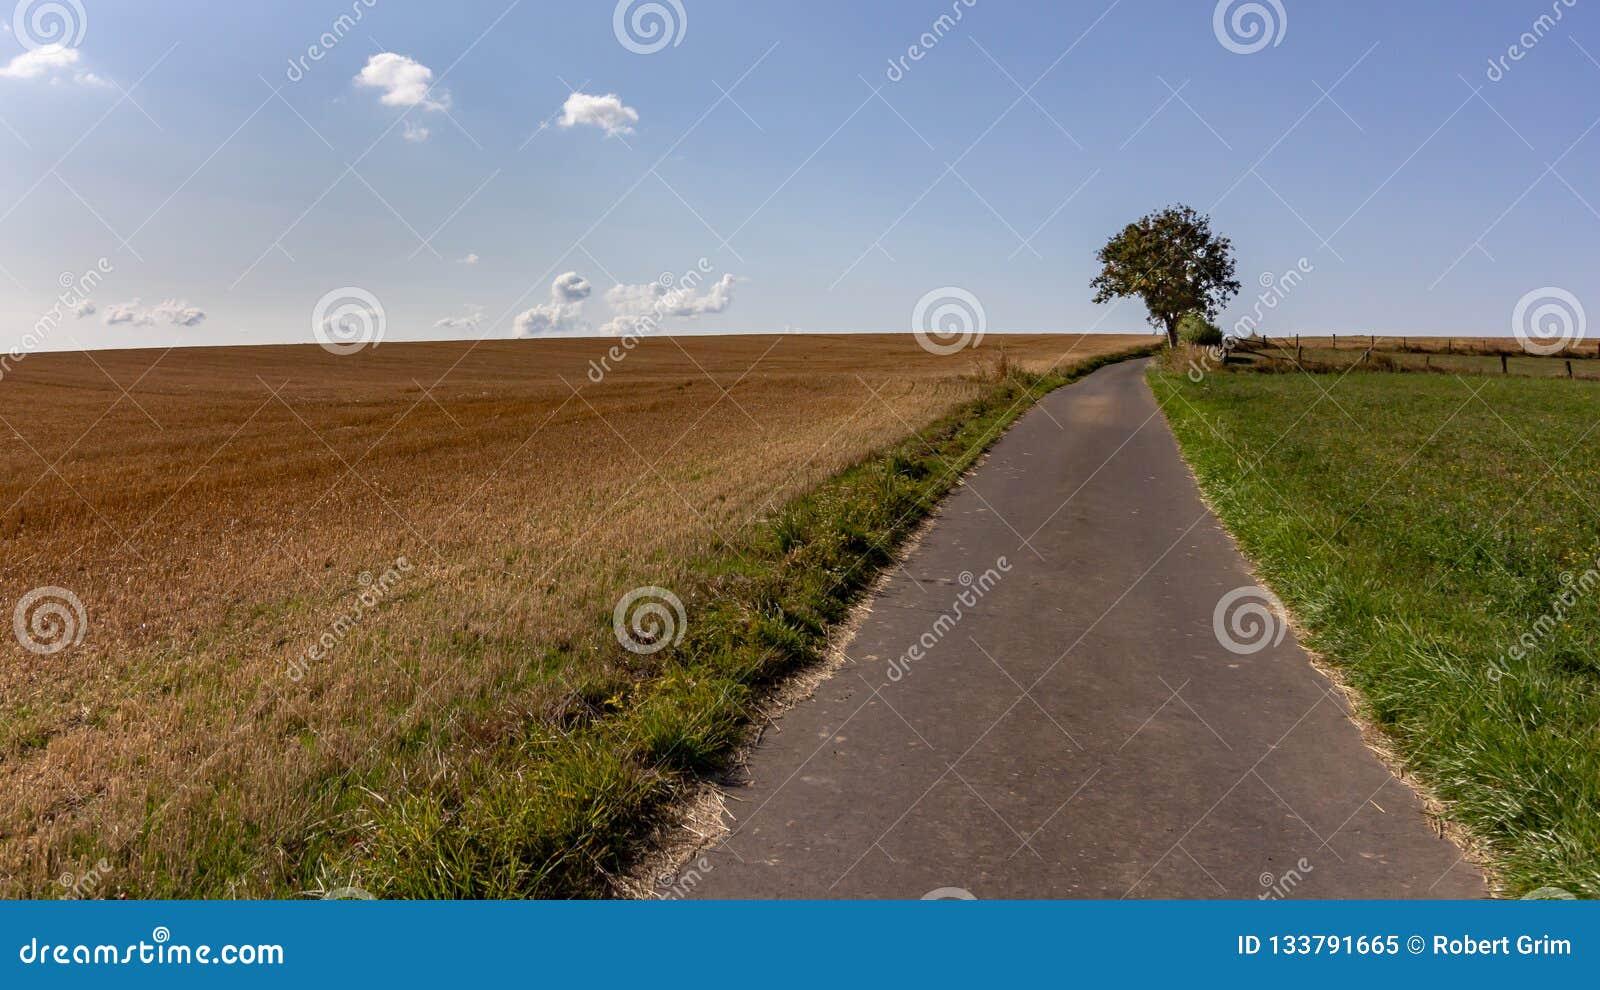 Single tree near a public path through farmland in Luxembourg